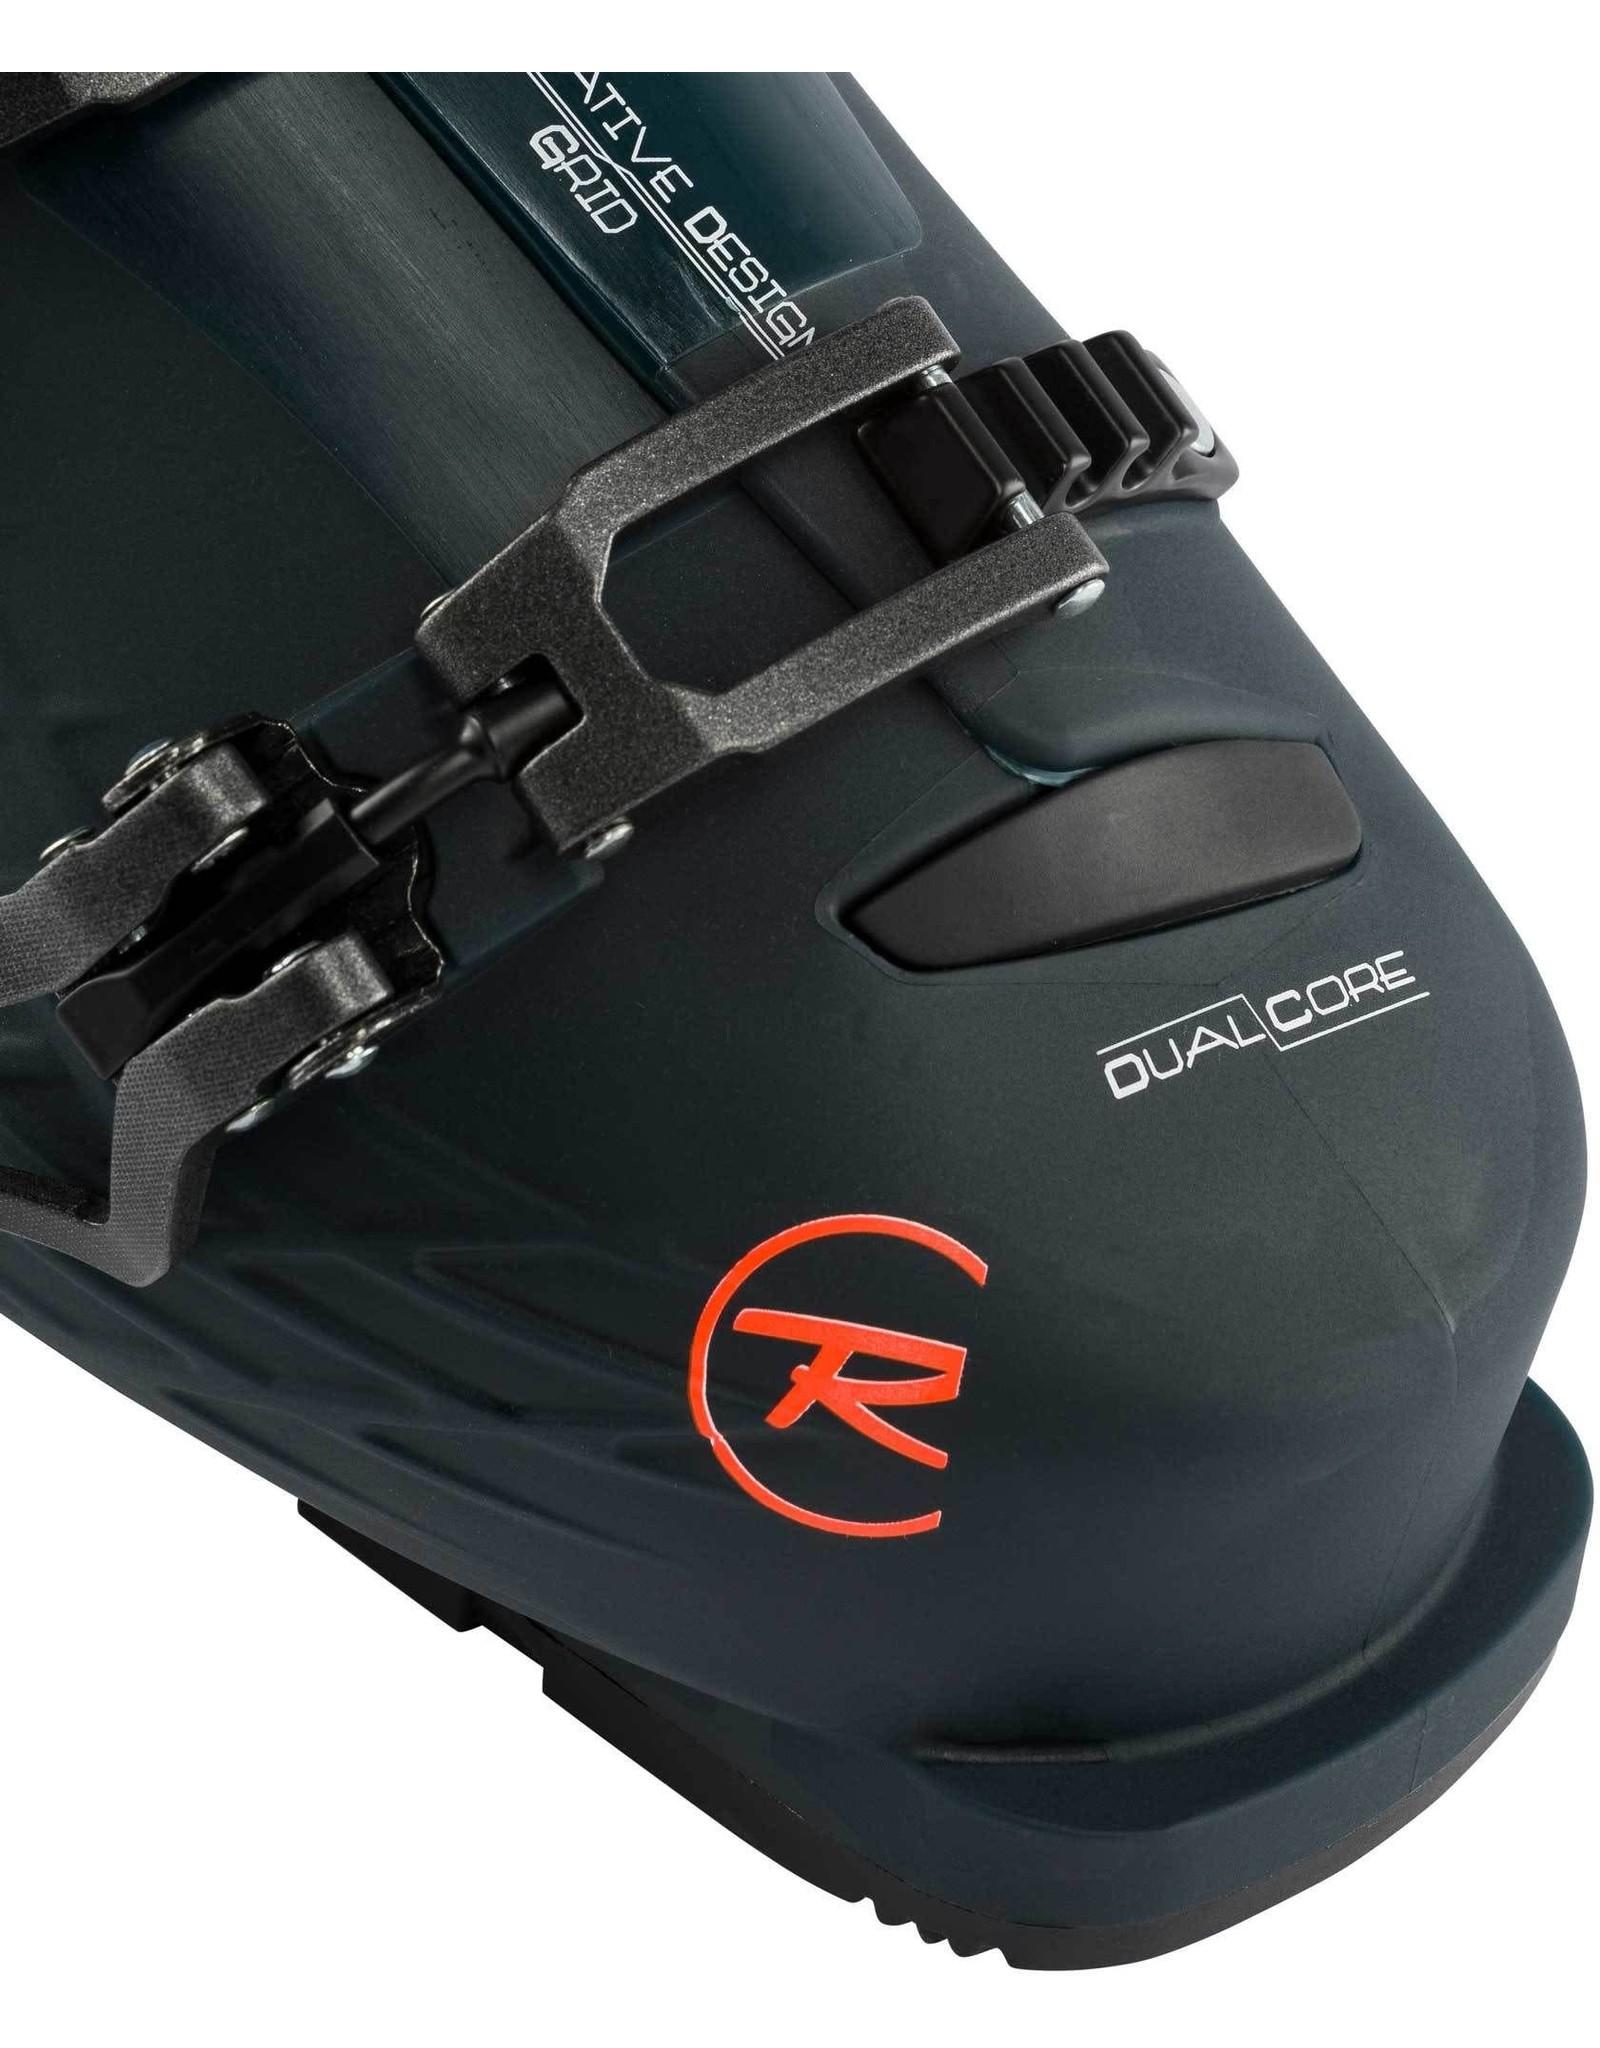 ROSSIGNOL ROSSIGNOL ALLTRACK PRO 120 DEEP BLUE ALPINE SKI BOOT MEN 20